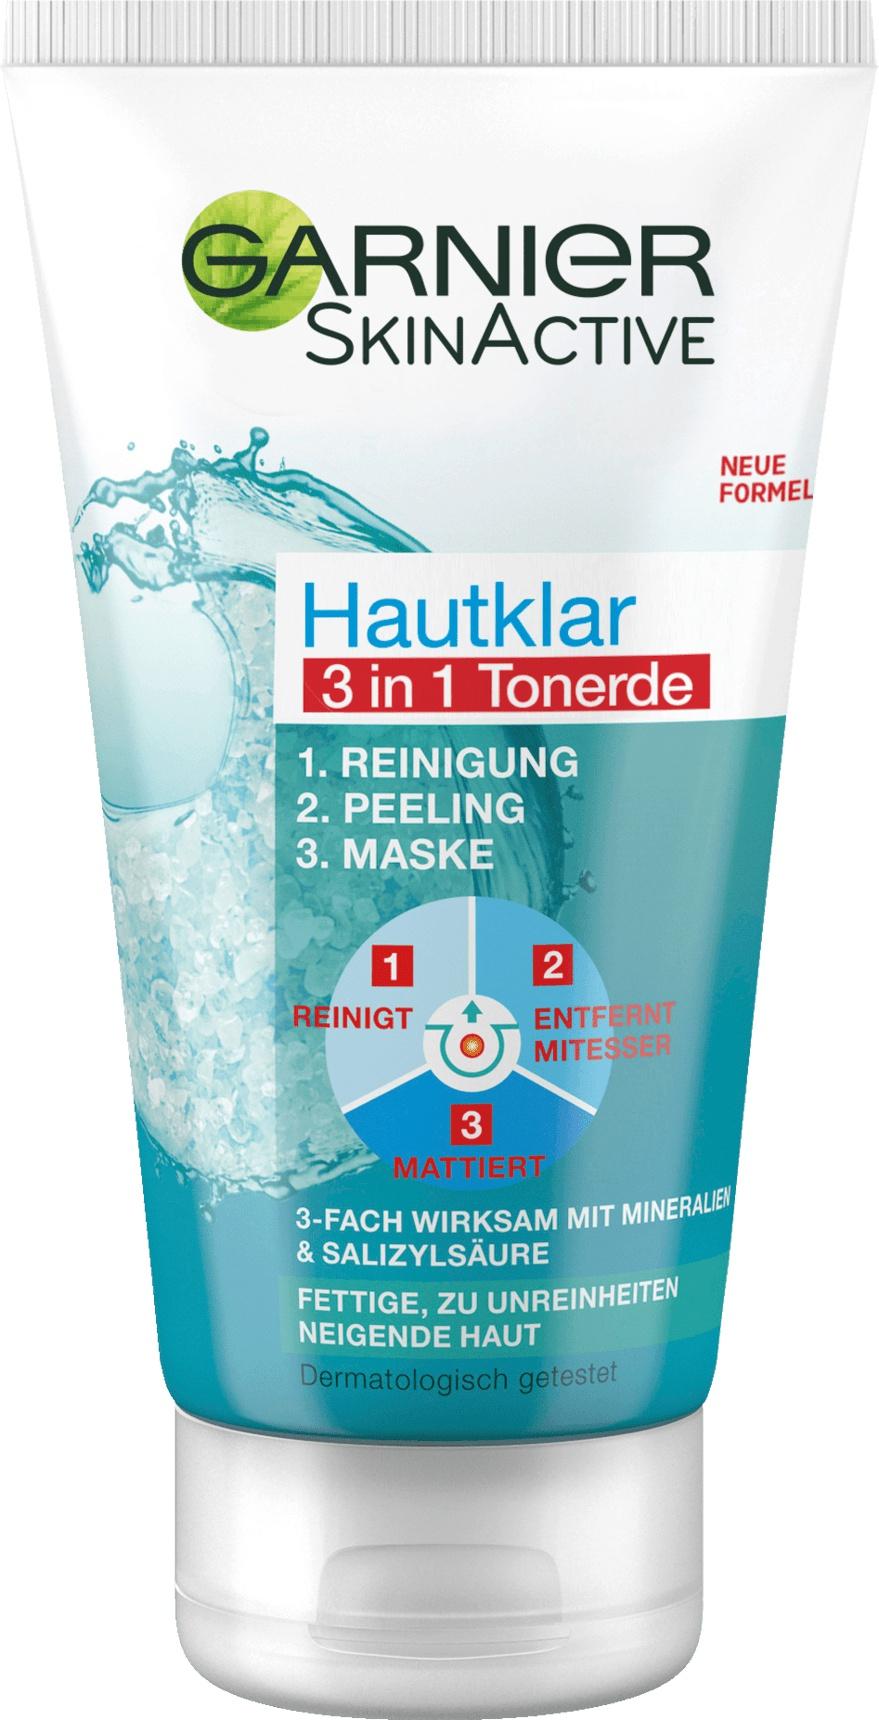 Garnier Skin Active Hautklar 3 In 1 Tonerde